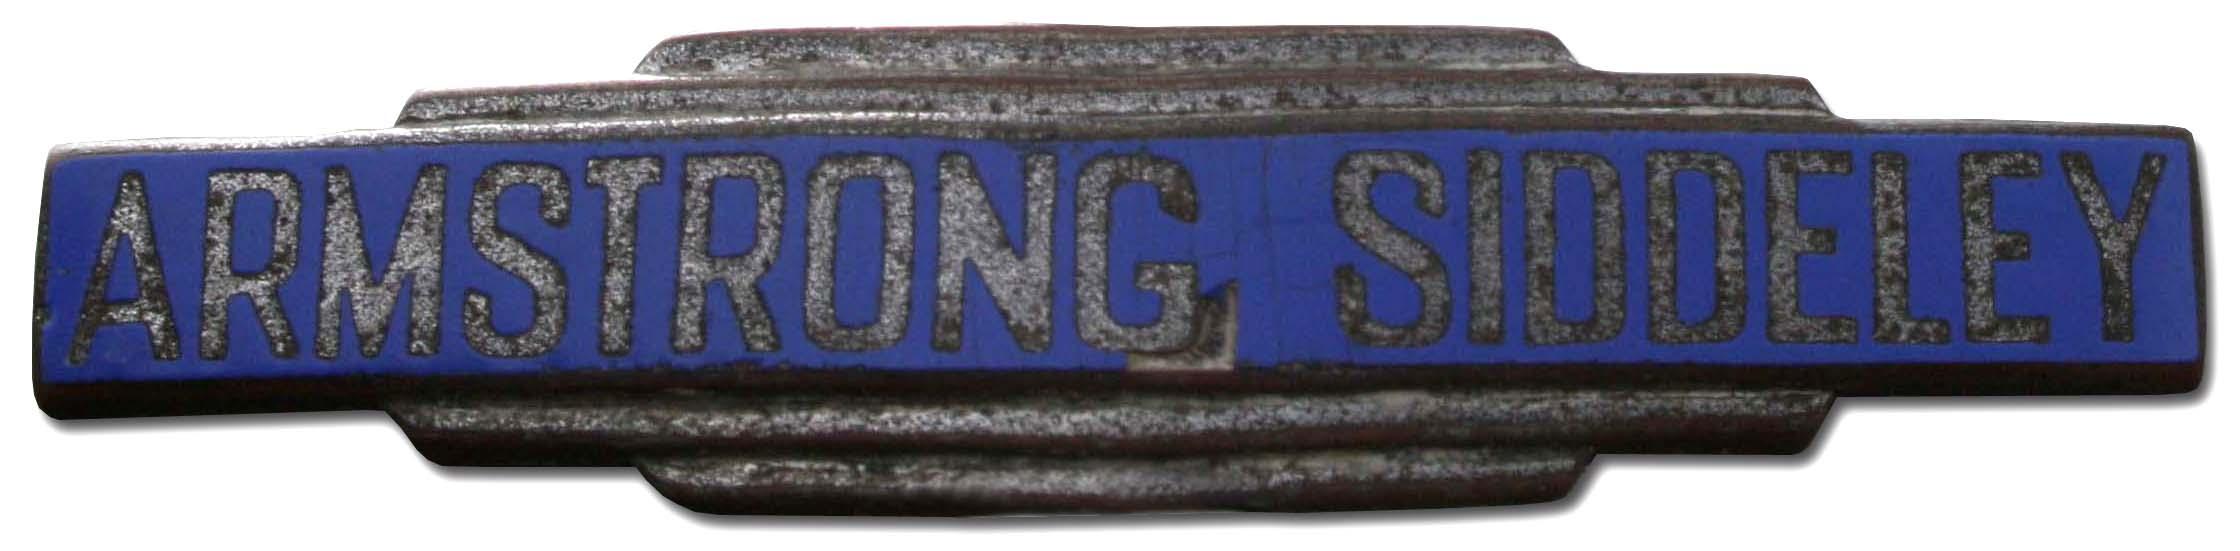 Armstrong Siddeley Sapphire MkI 3.4 Litre (1956 grill emblem)